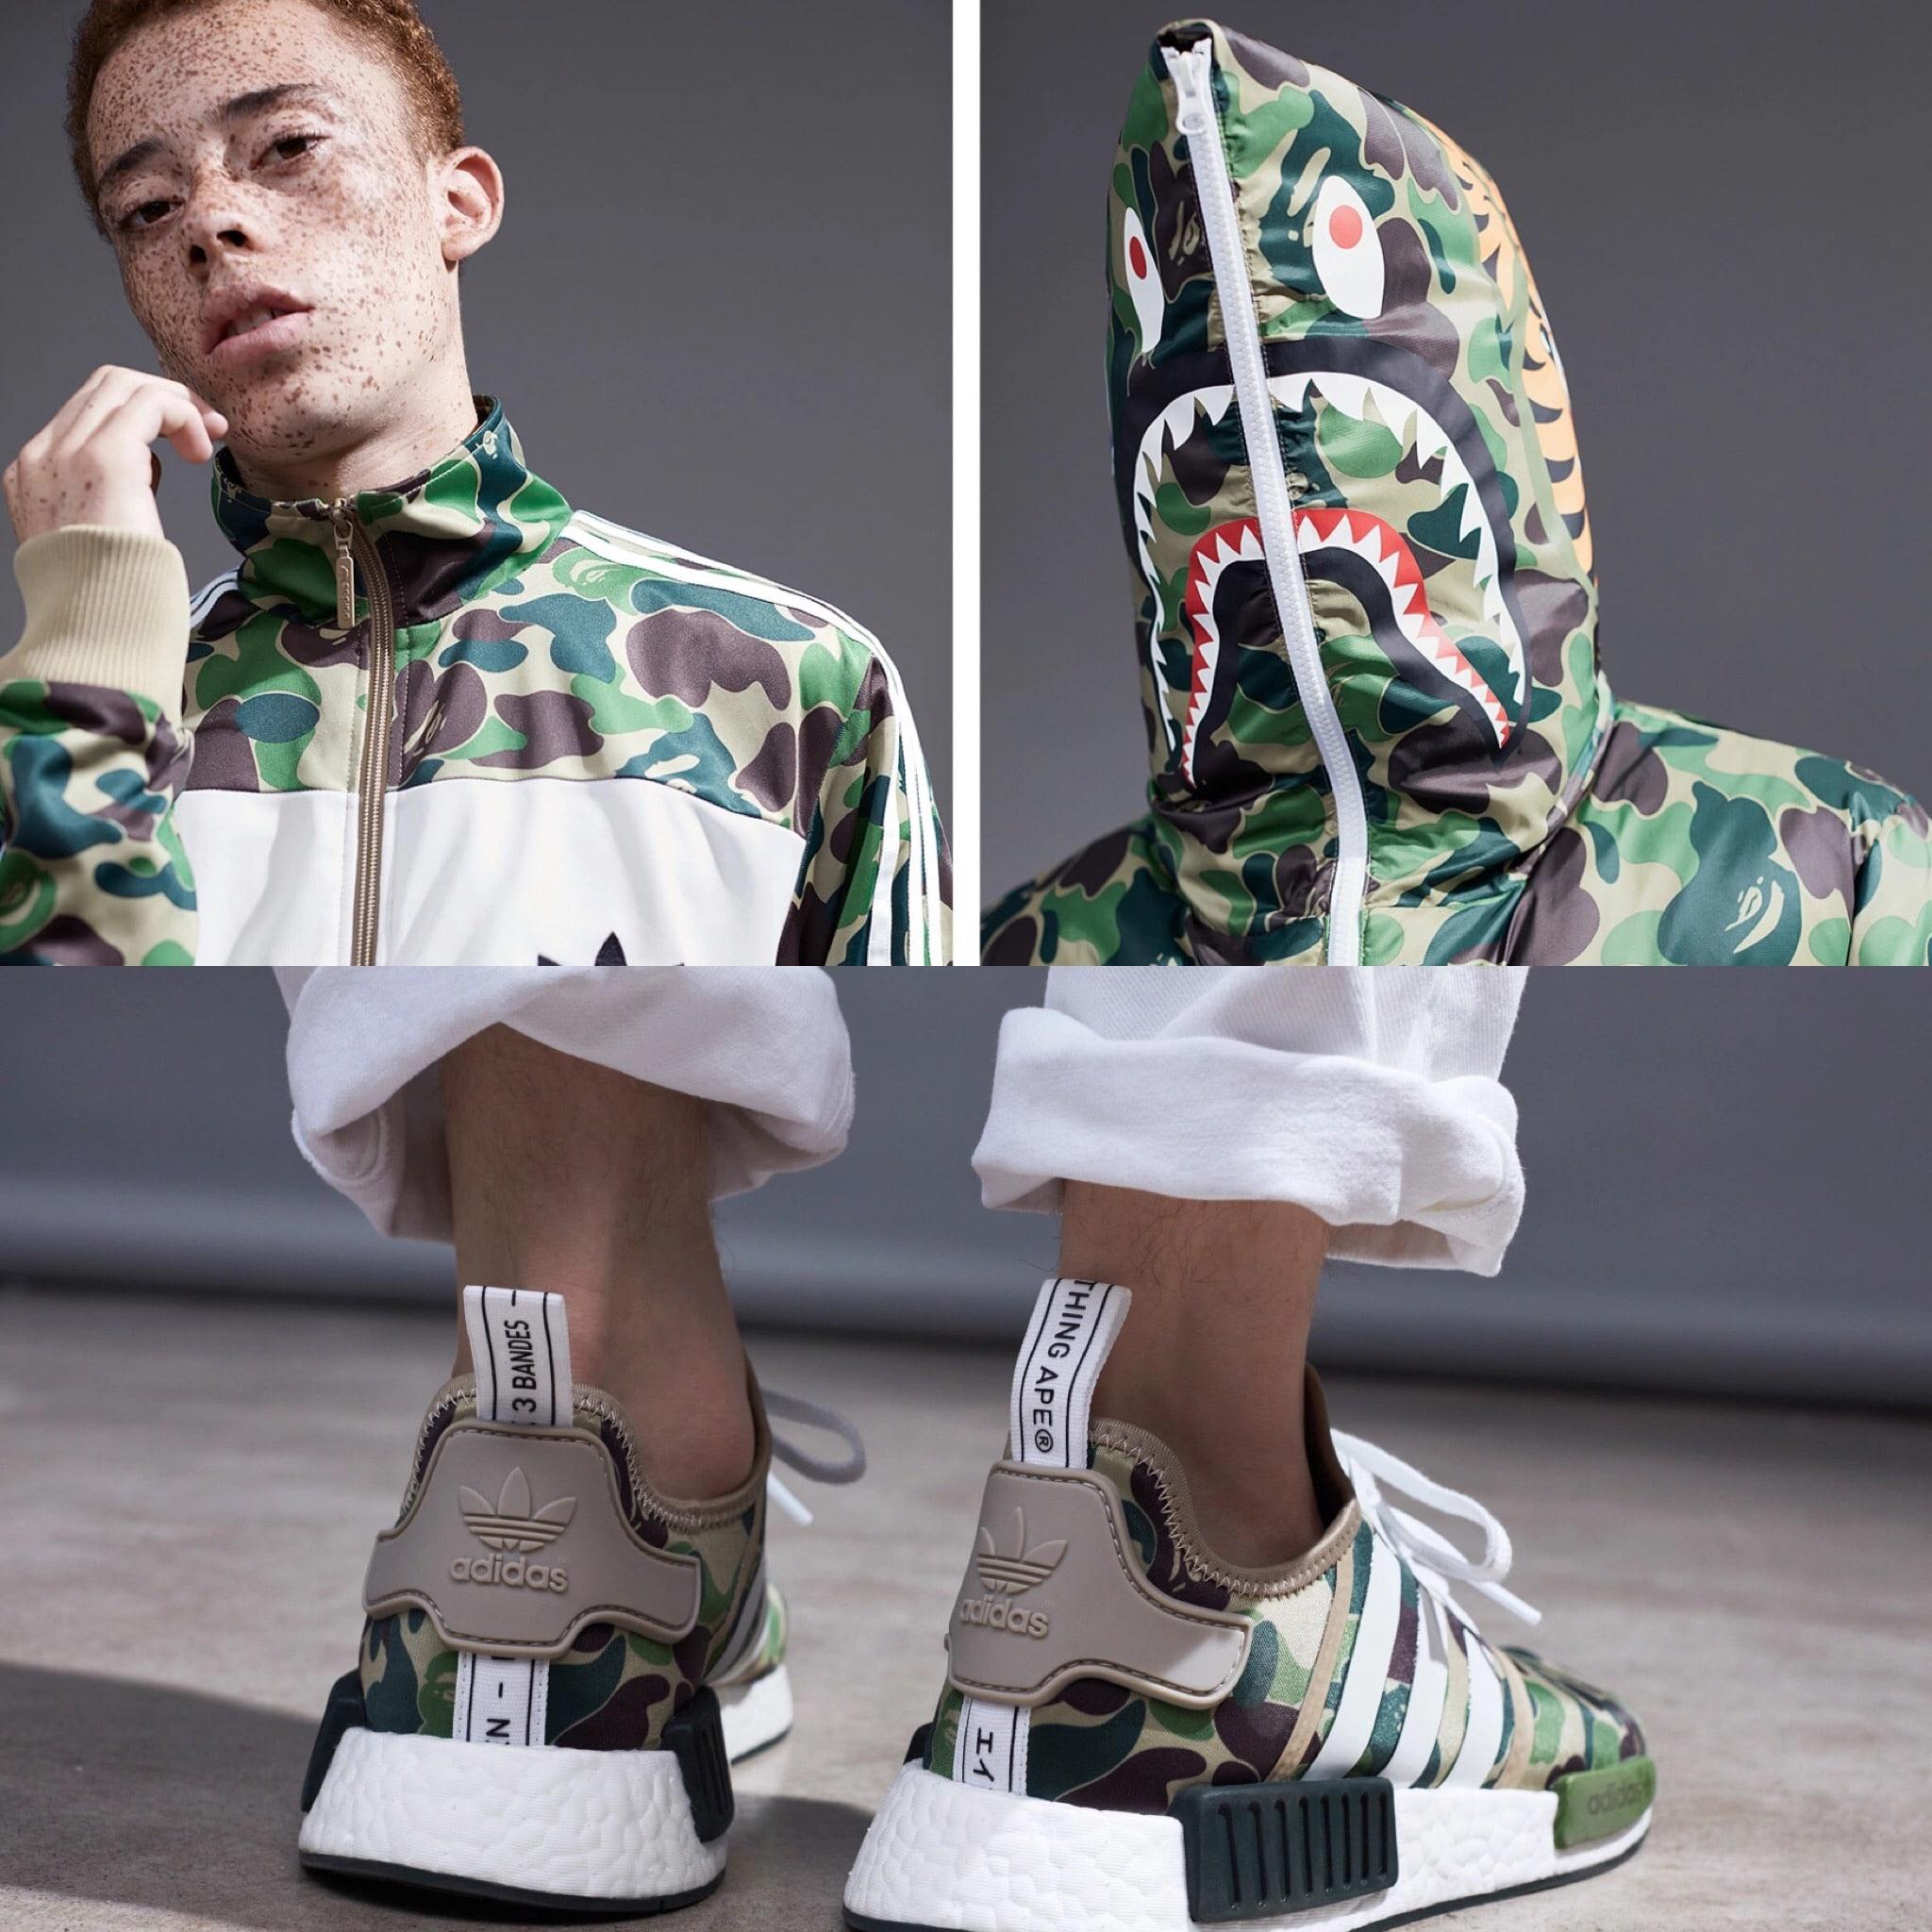 BAPE adidas Originals 2016 sneakers jackets